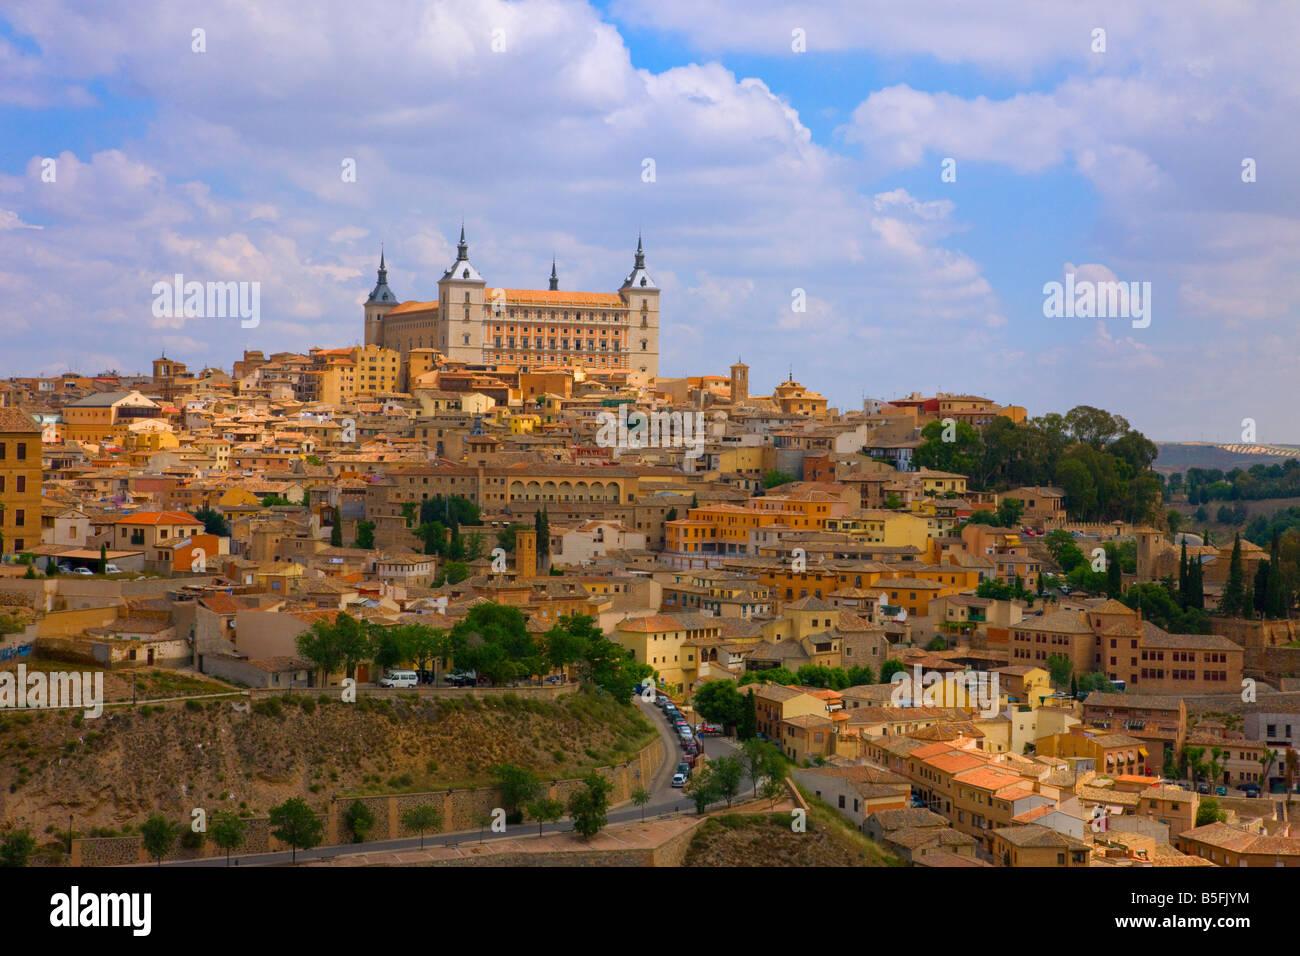 Castilla La Mancha Toledo Spain - Stock Image